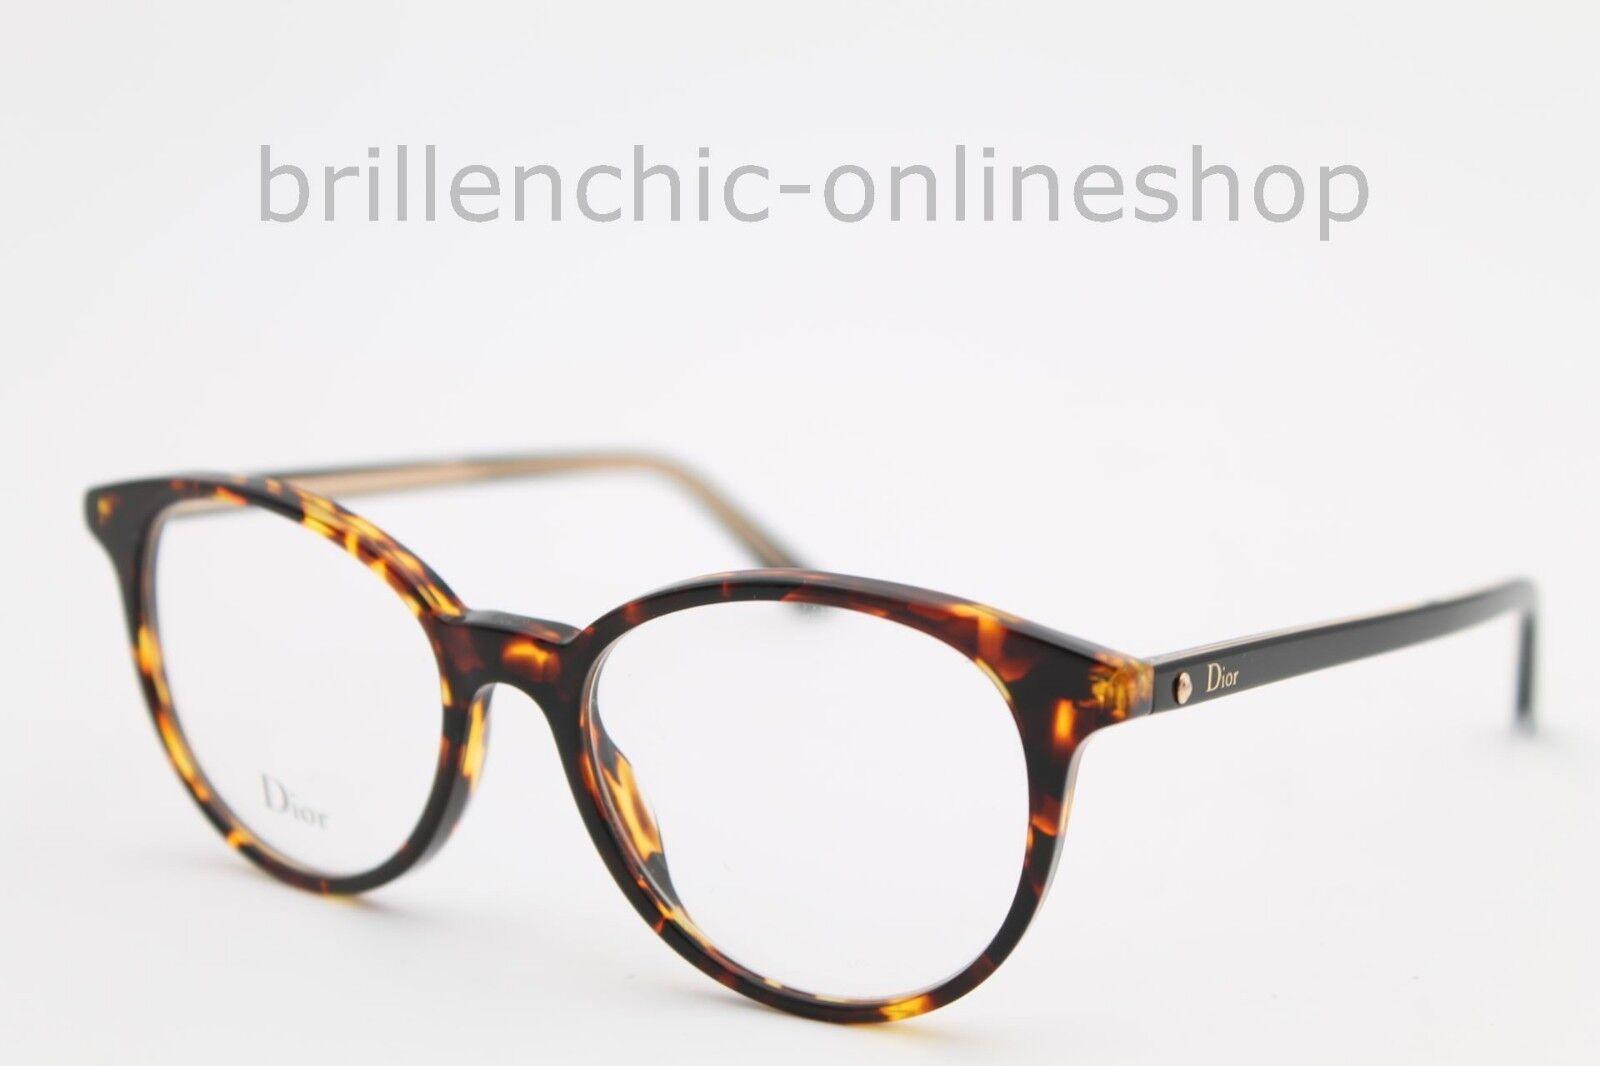 Dior Brille Montaigne 47 col. 086 17 NEU Christian Dior